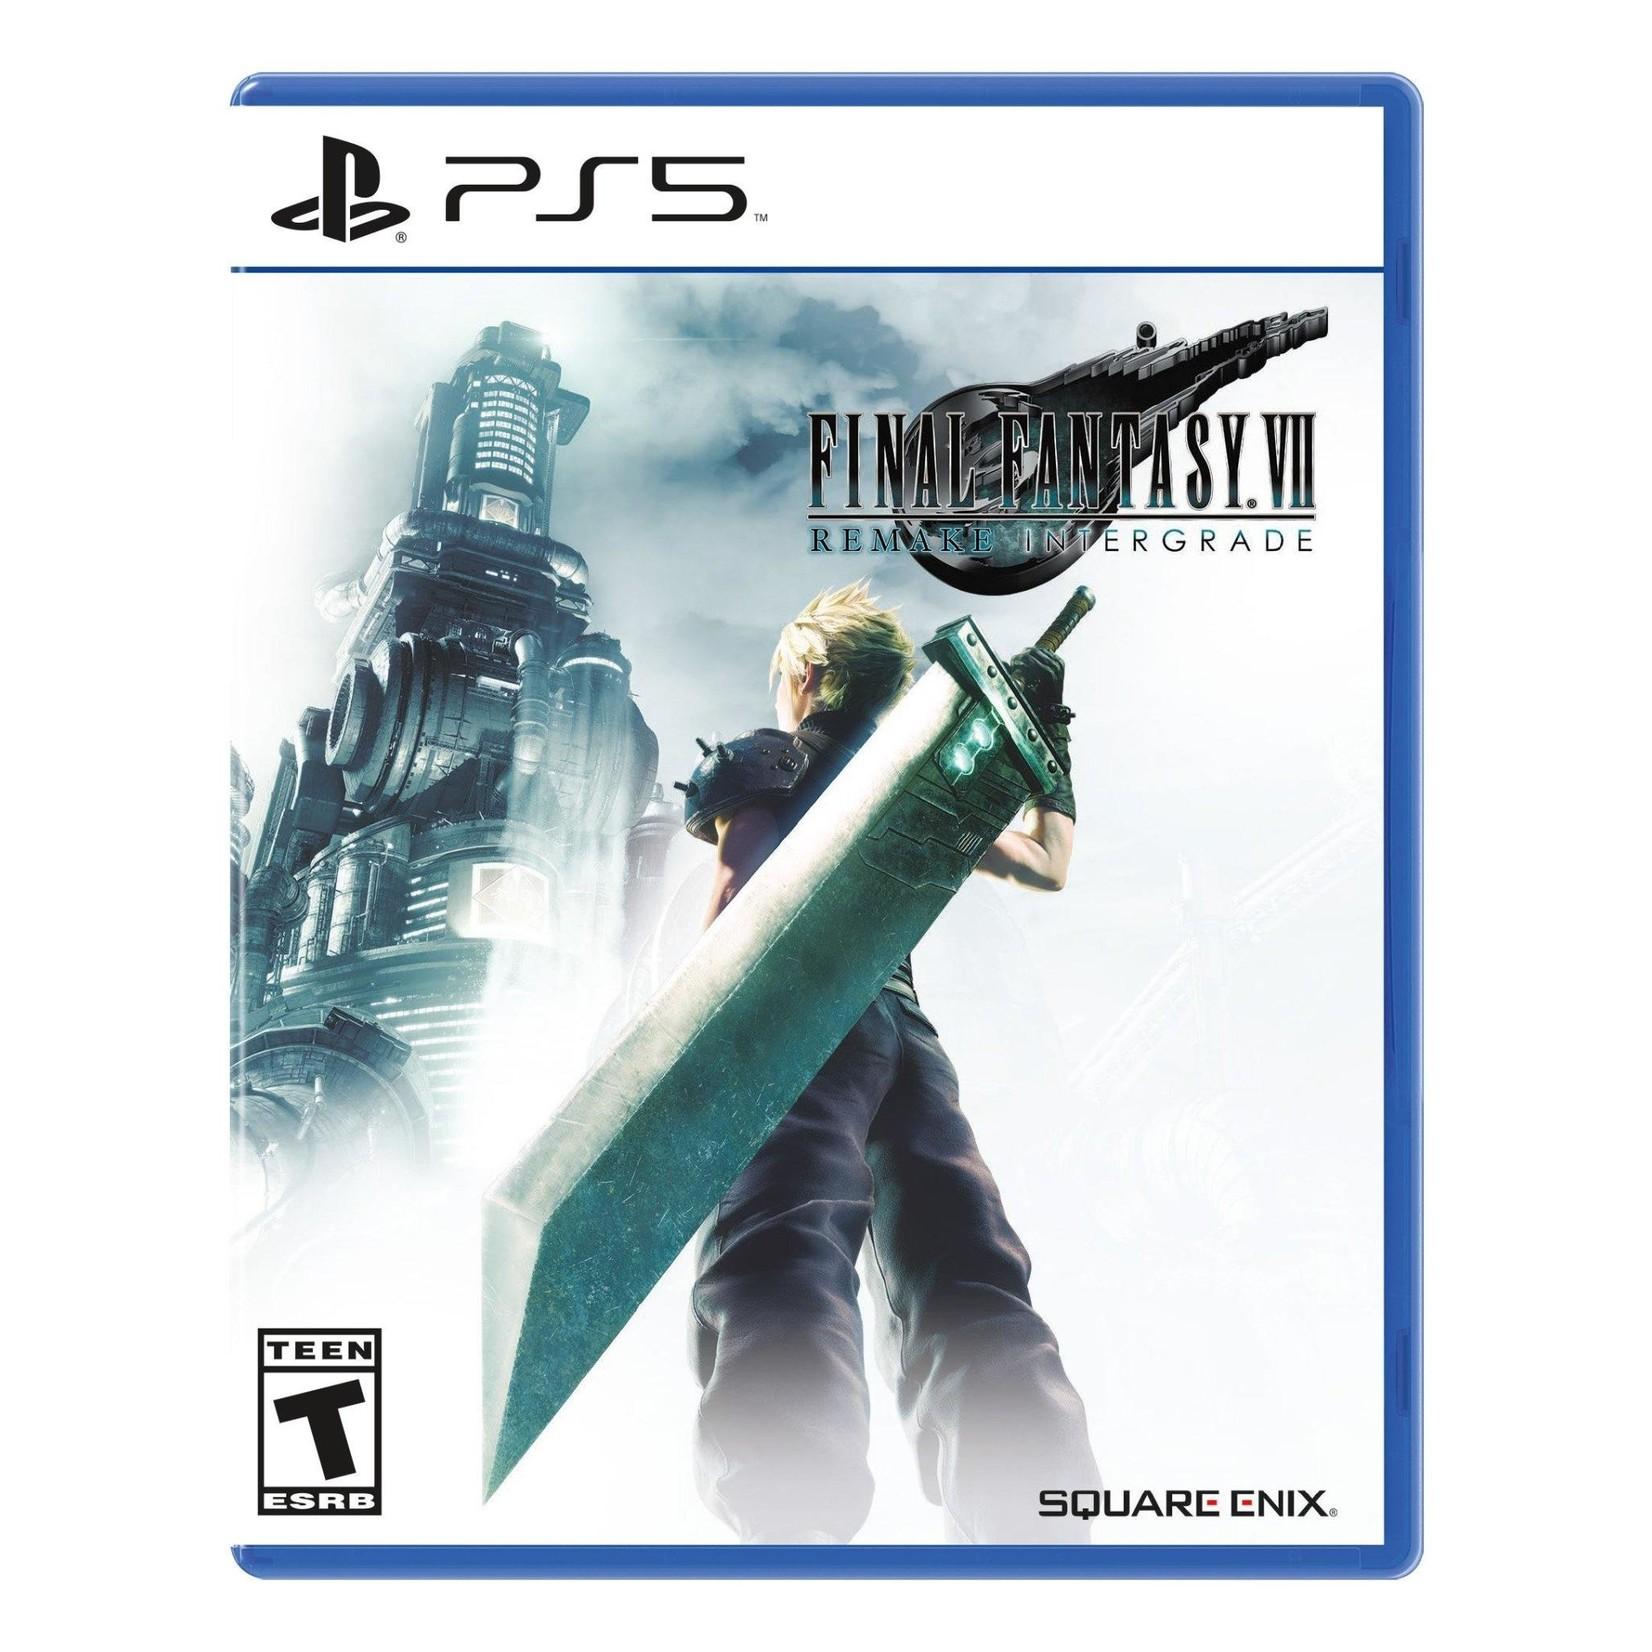 PS5-Final Fantasy VII Remake Intergrade